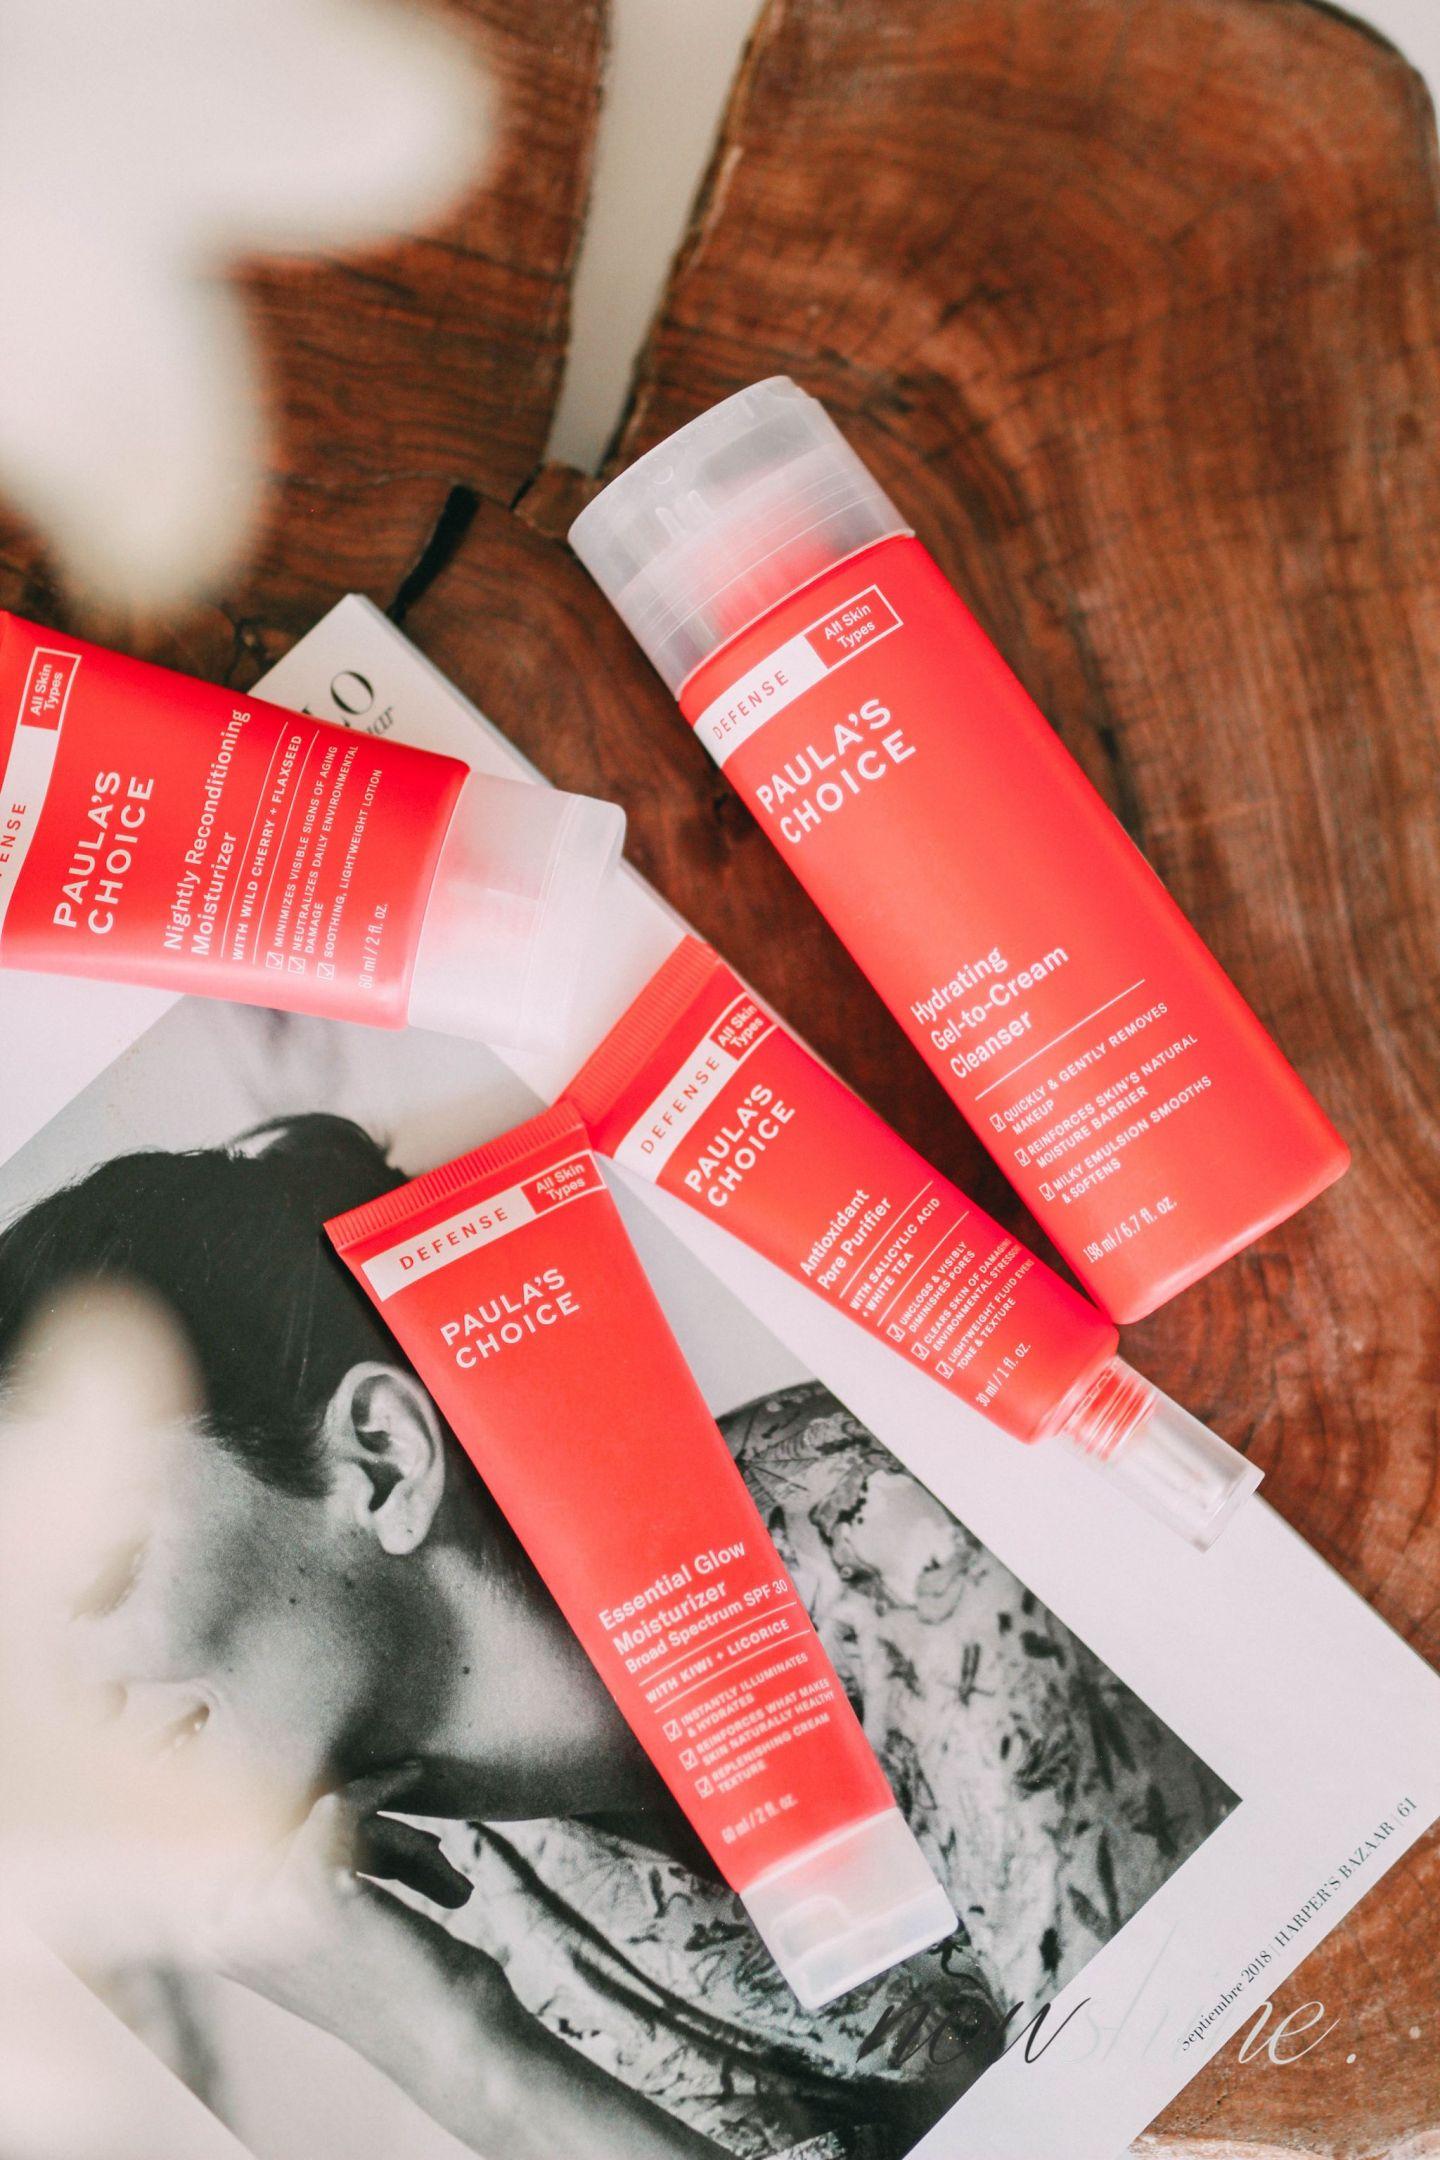 Defense Line von Paula´s Choice - Nowshine Beauty ü40 - my life, my city, my skin Kampagne Produkte